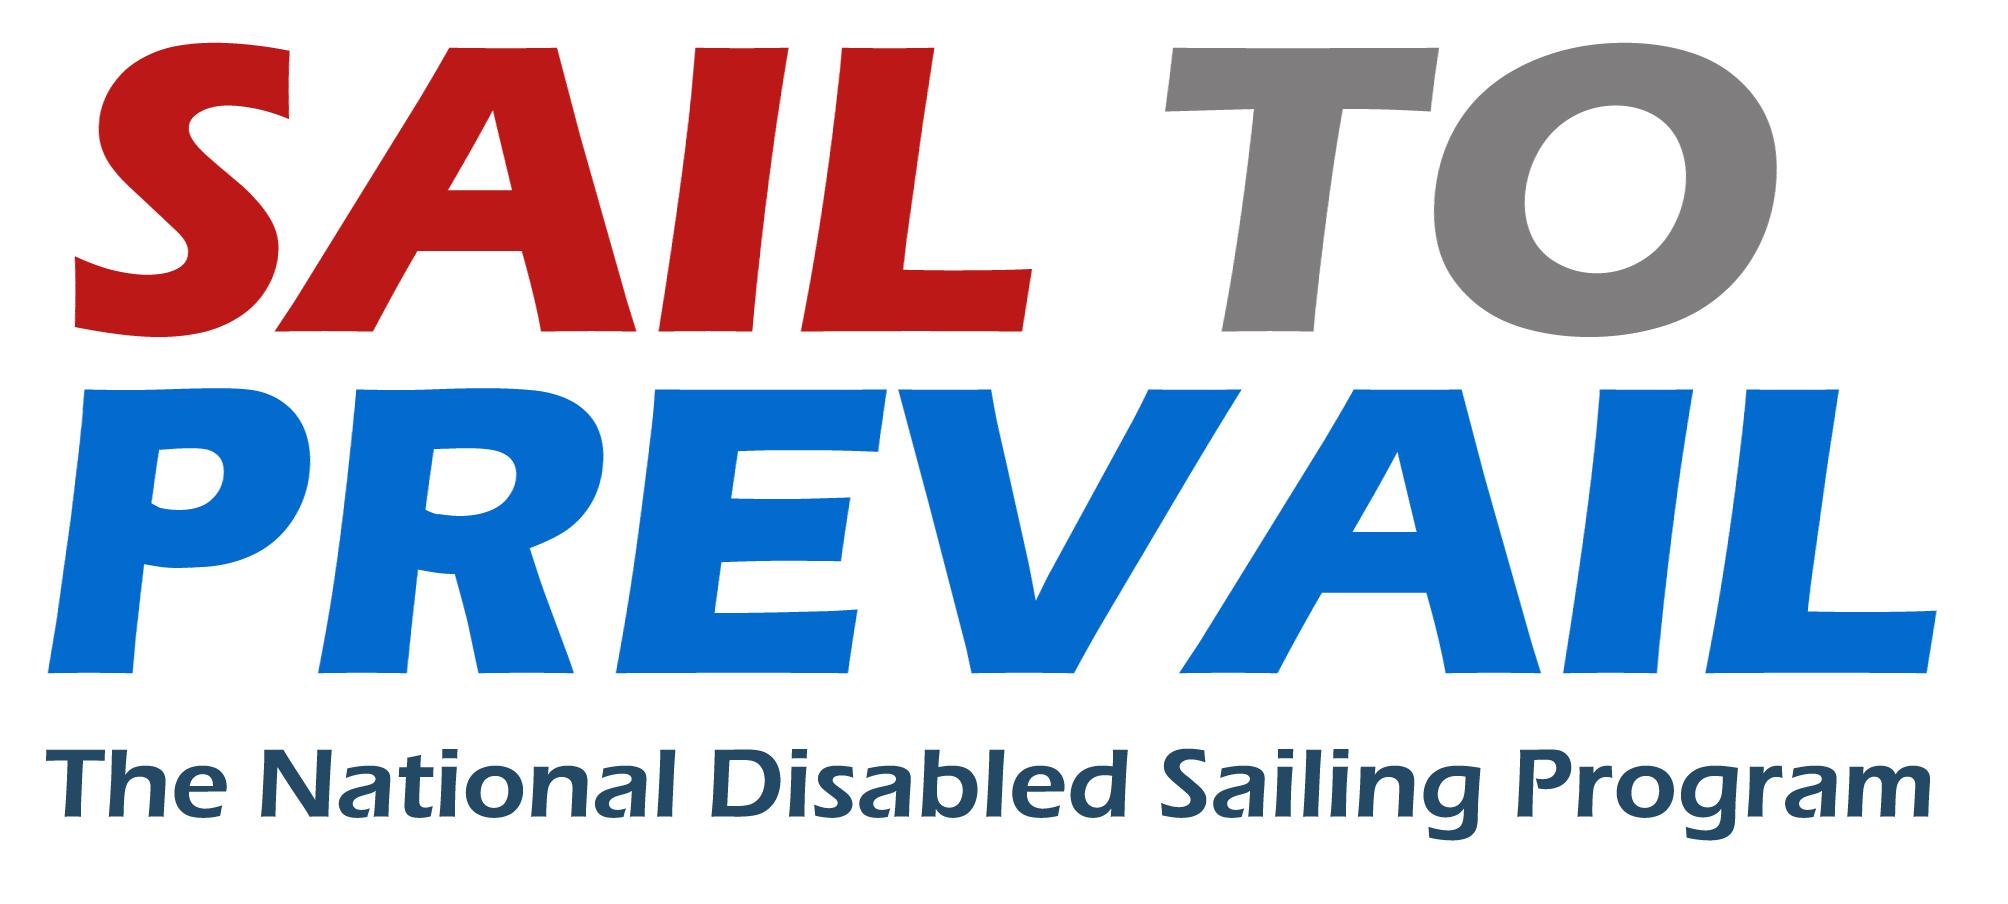 Sail_to_Prevail_logo.jpg